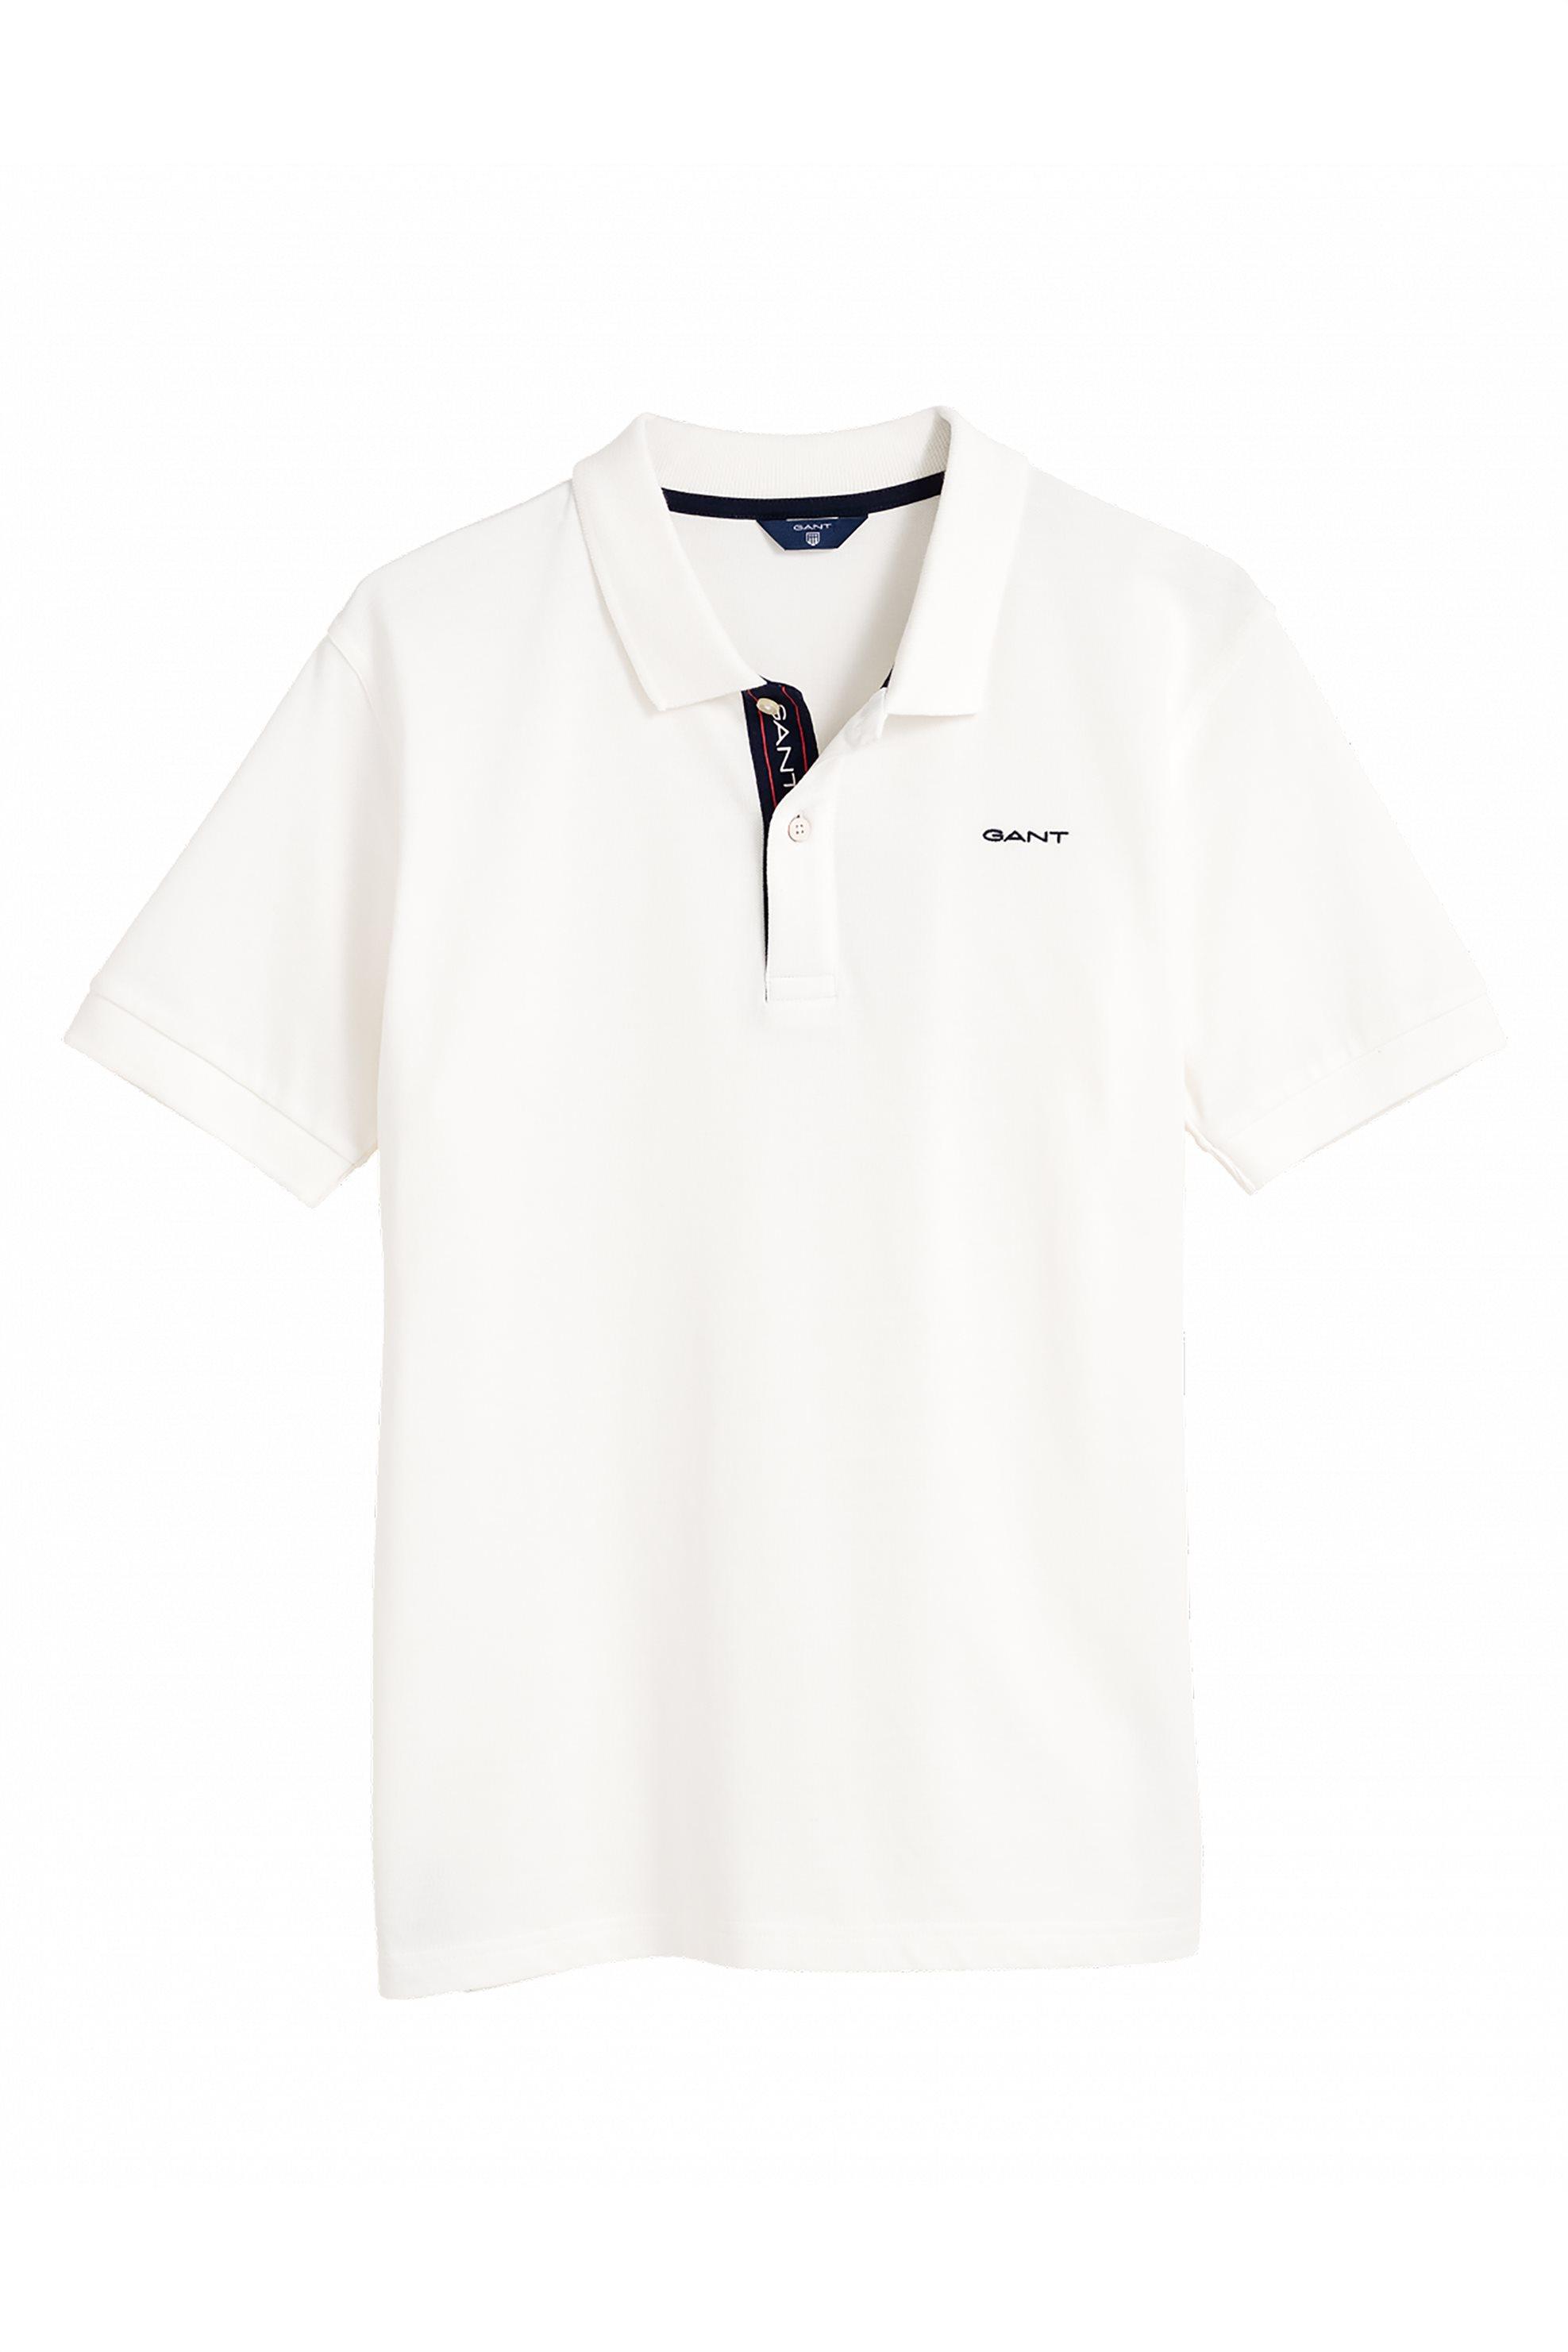 793b02f6328 Notos Gant παιδική μπλούζα πόλο με λεπτομέρεια στην πατιλέτα (9-15 ετών) -  902544